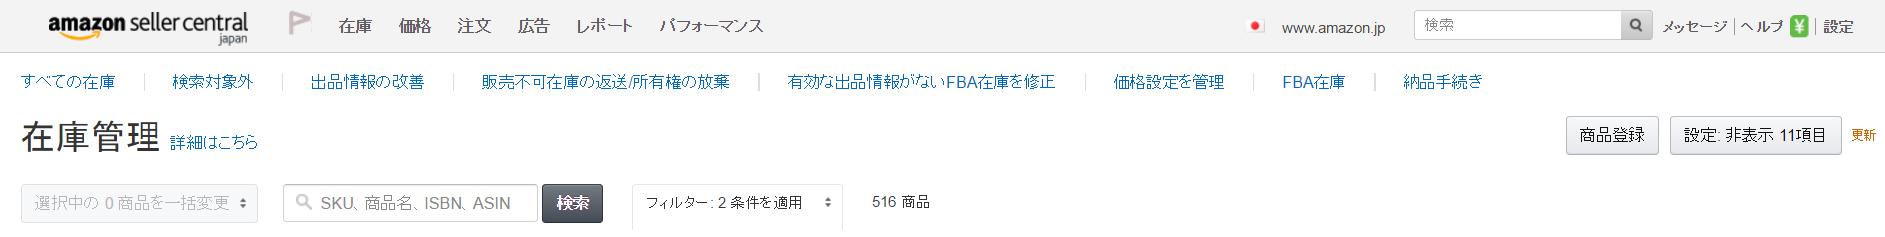 SnapCrab_NoName_2016-9-1_10-56-31_No-00